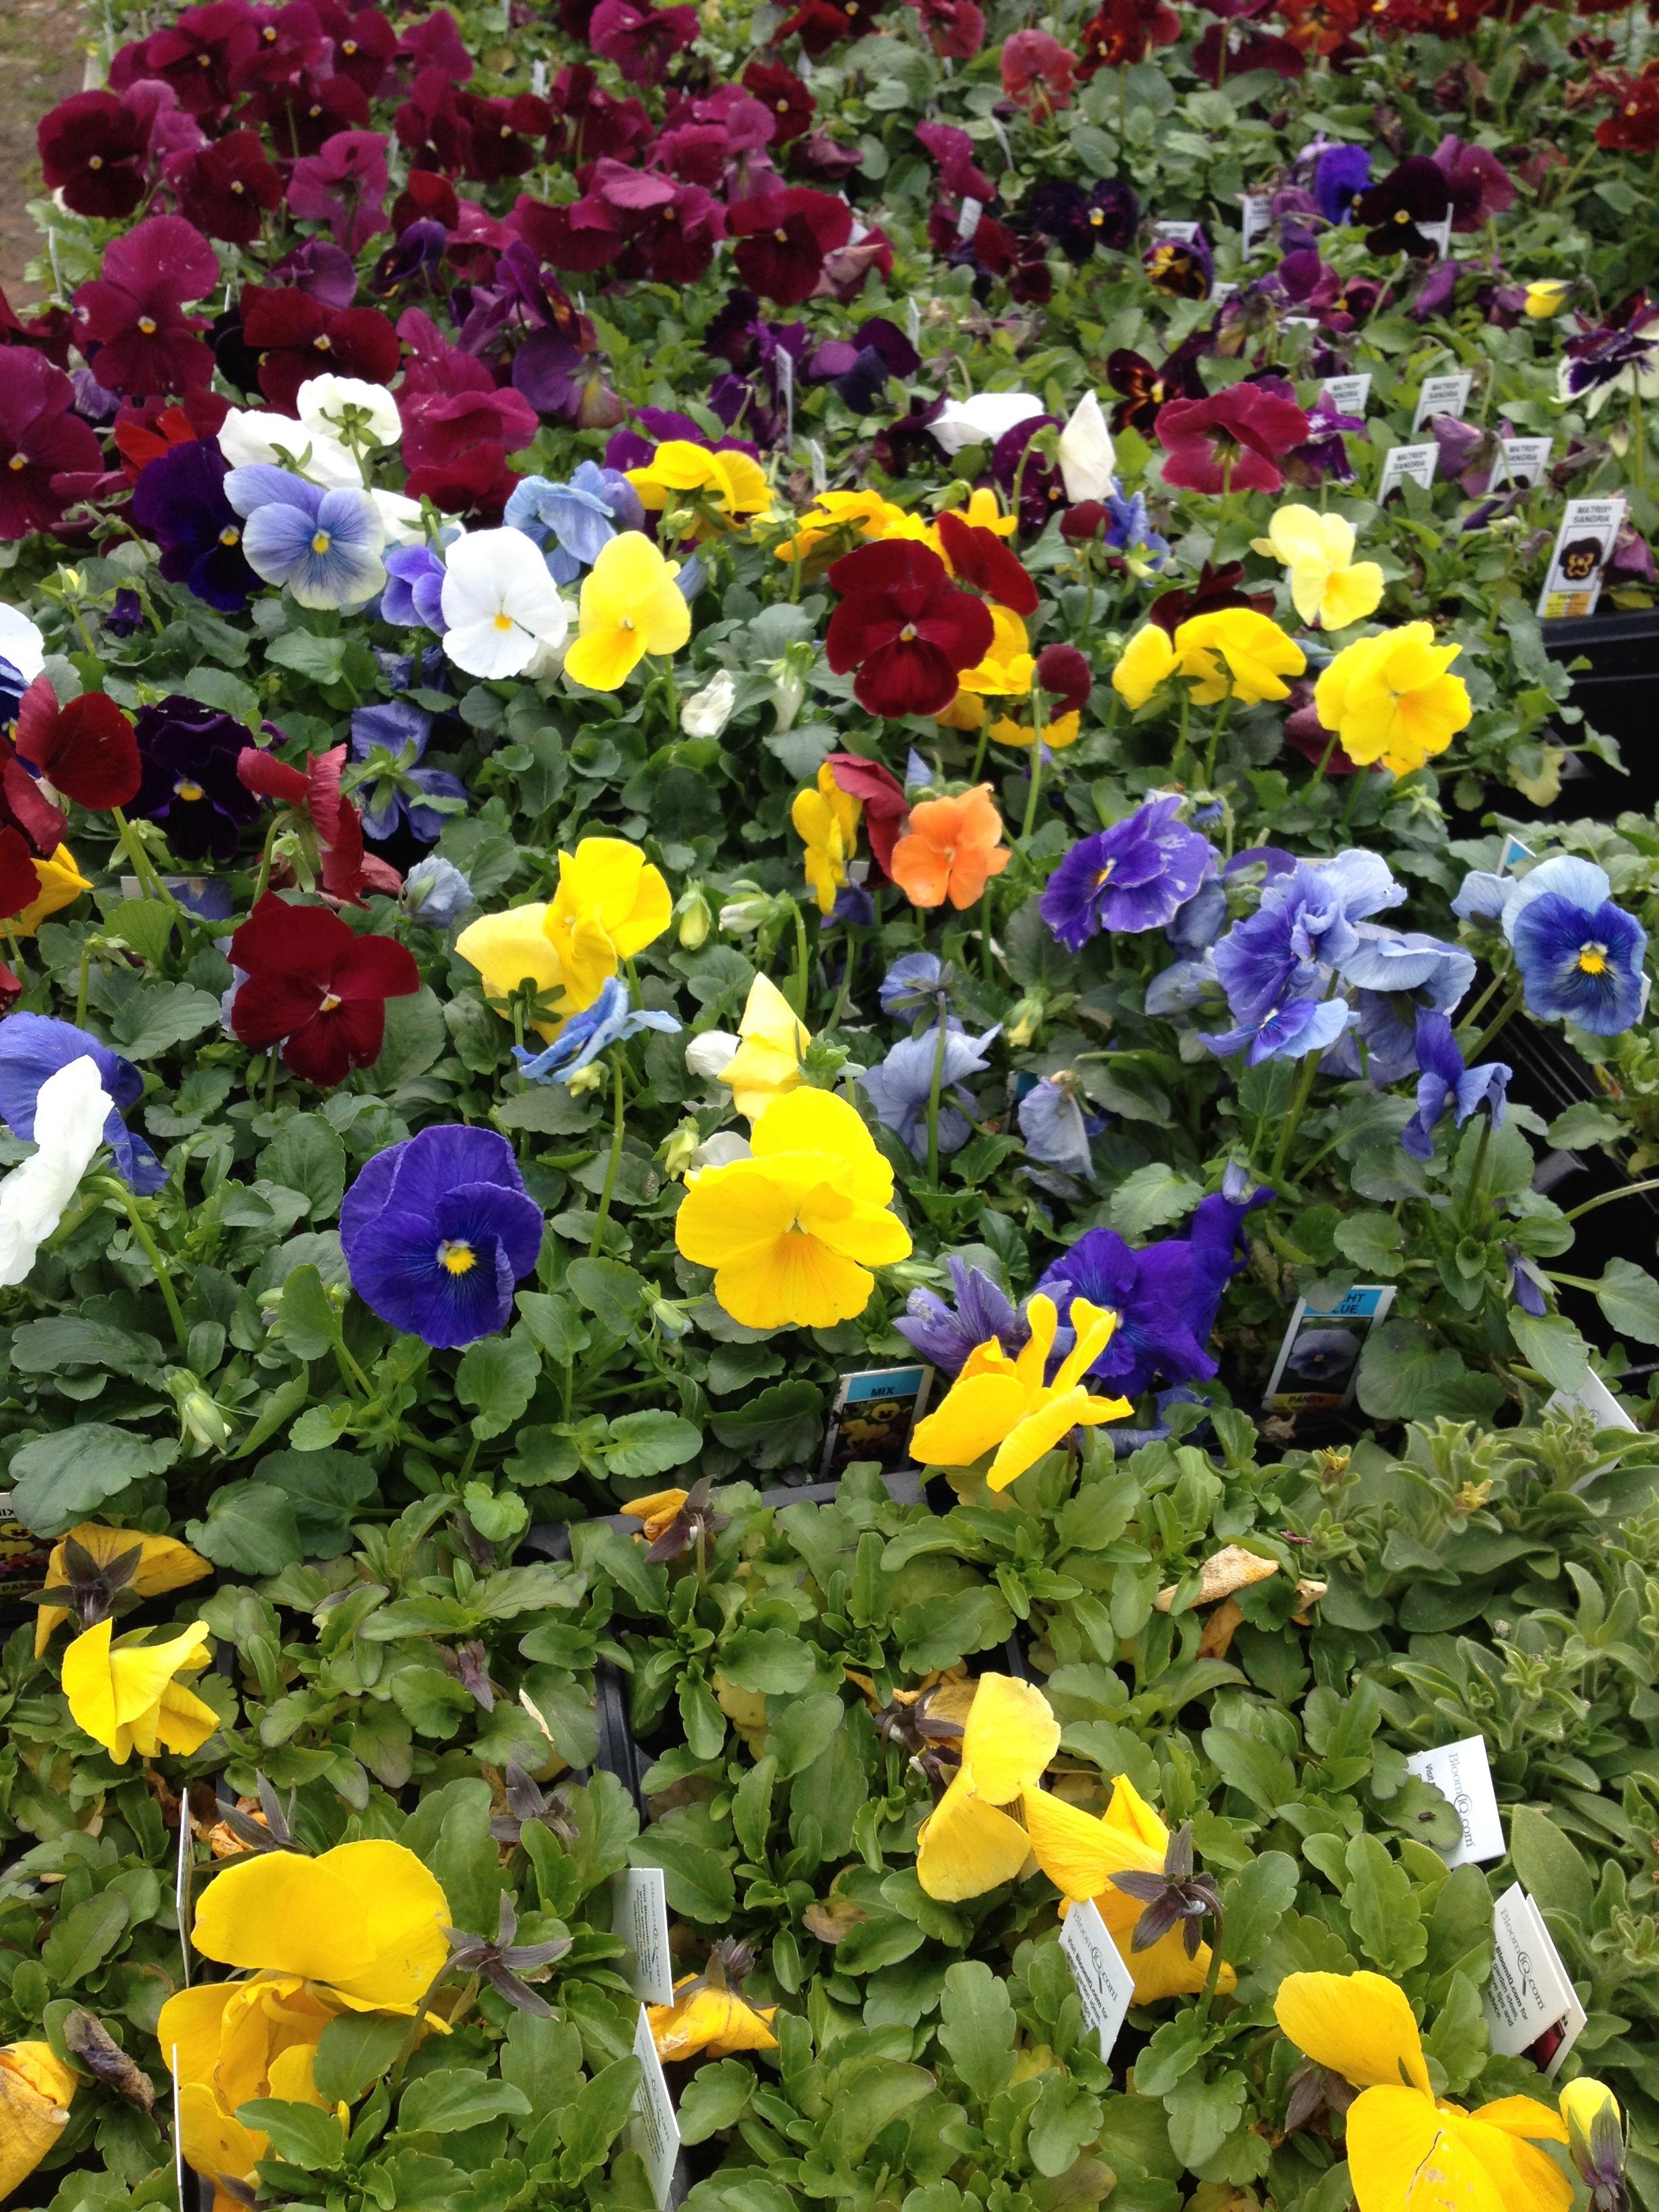 pansies at garden center